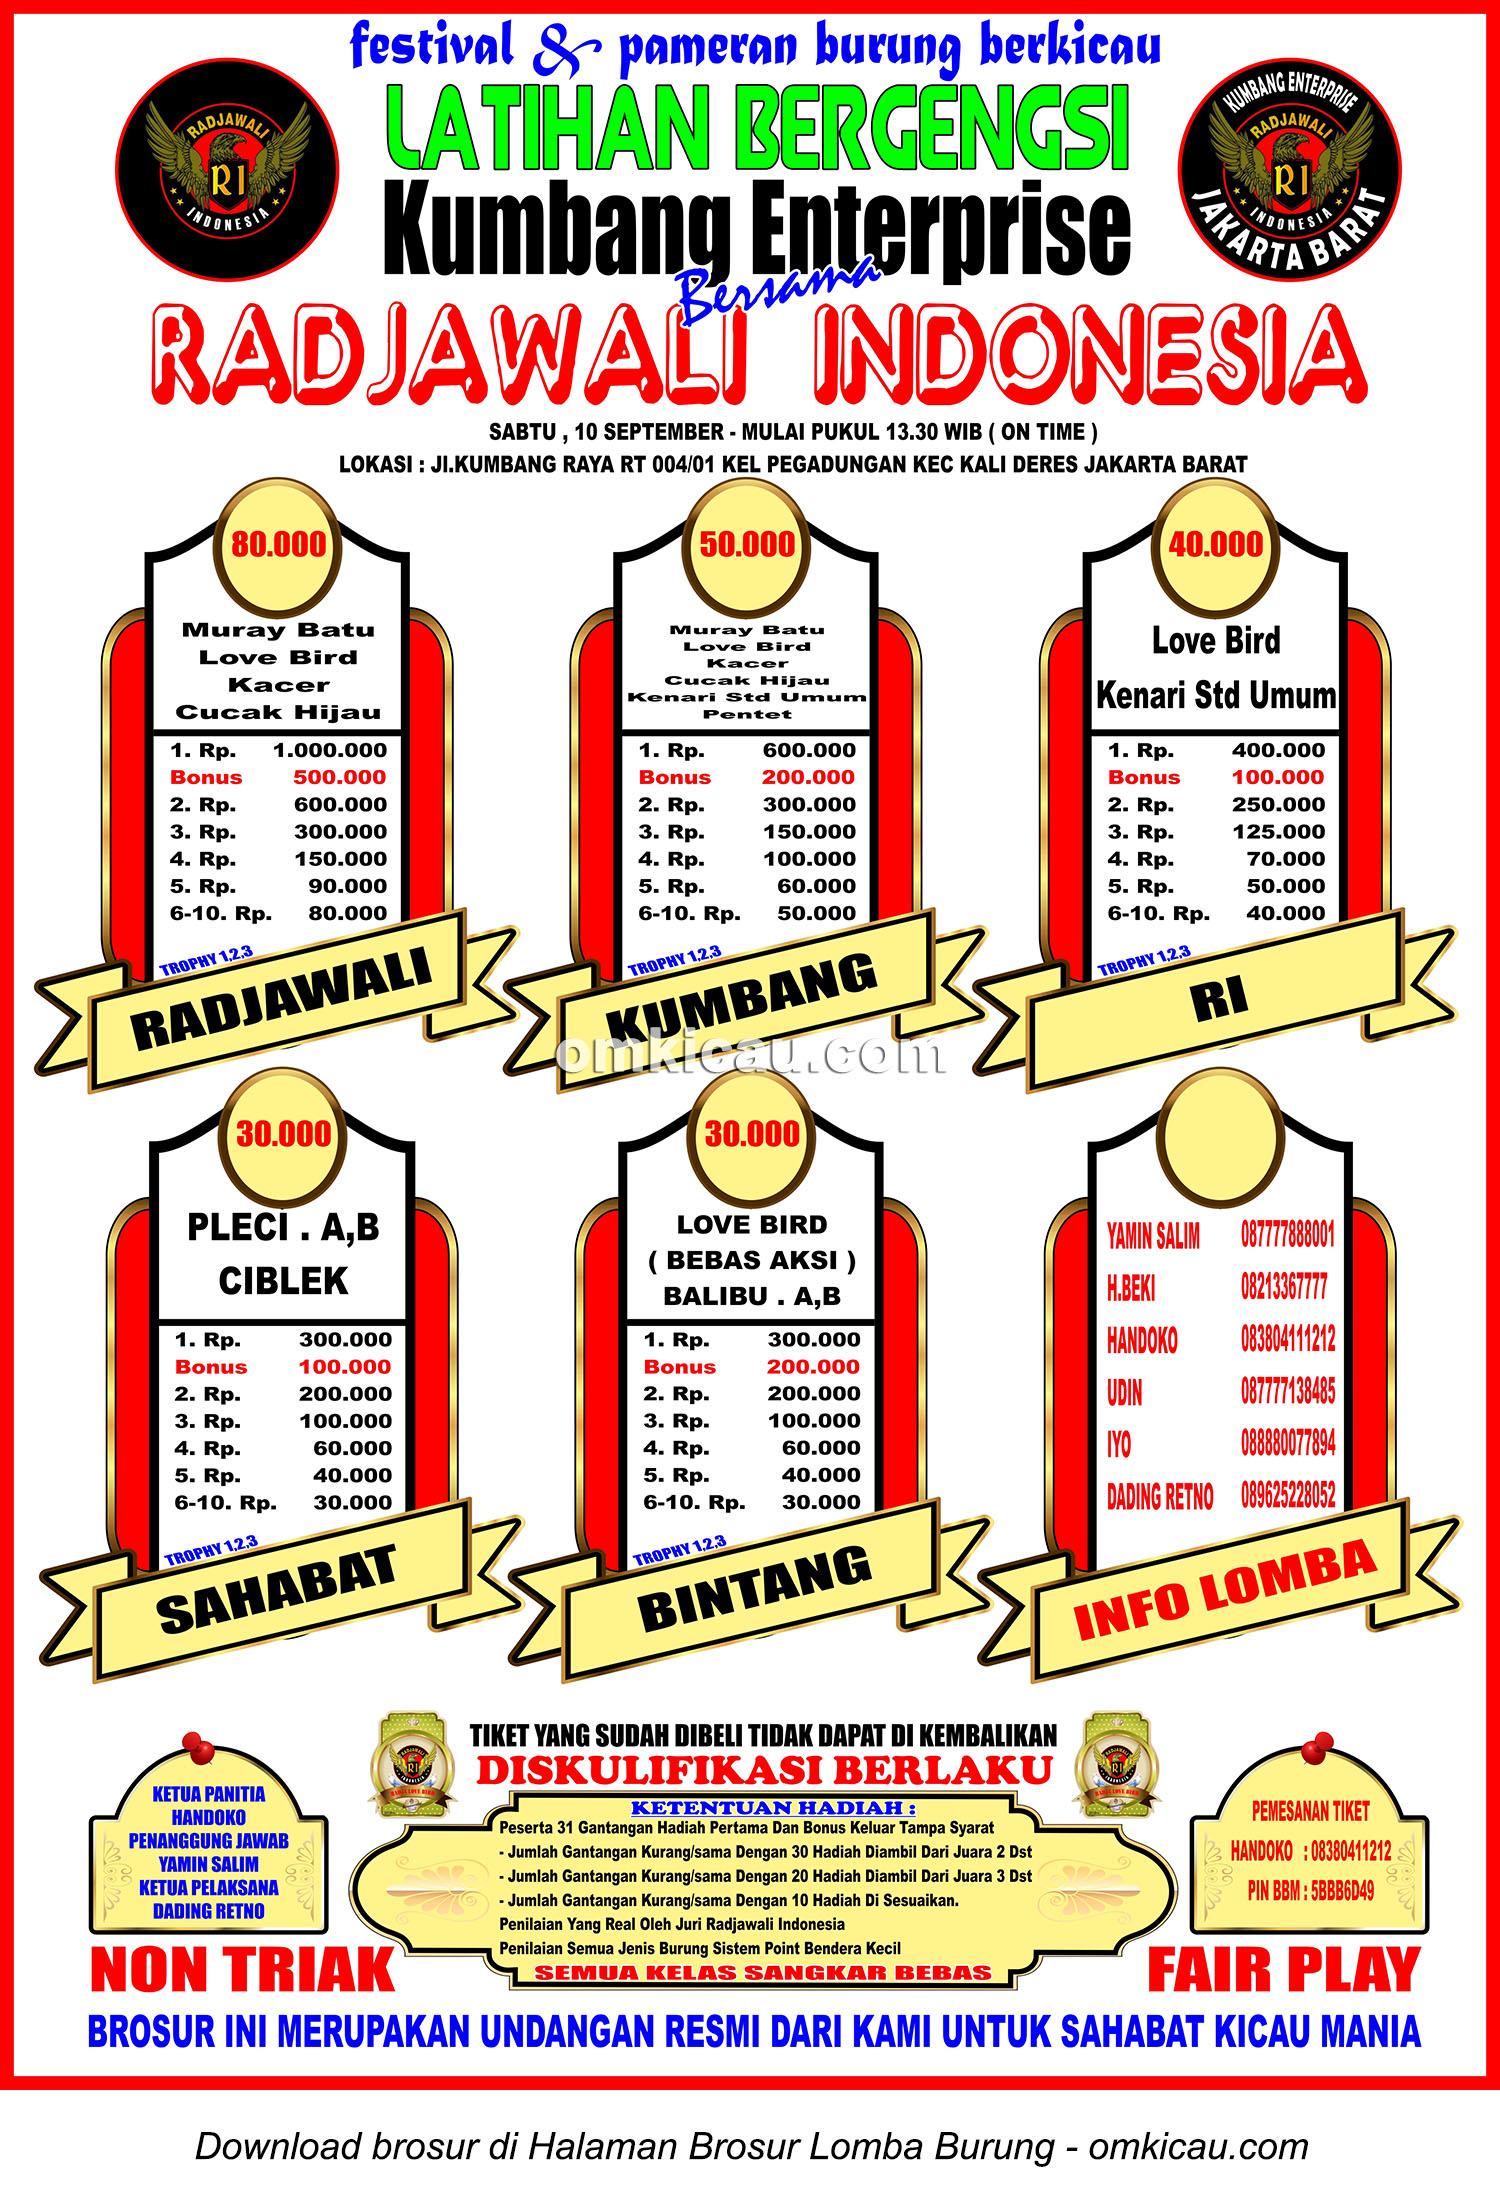 Brosur Latihan Bergengsi Kumbang Enterprise bersama Radjawali Indonesia, Jakarta Barat, 10 September 2016